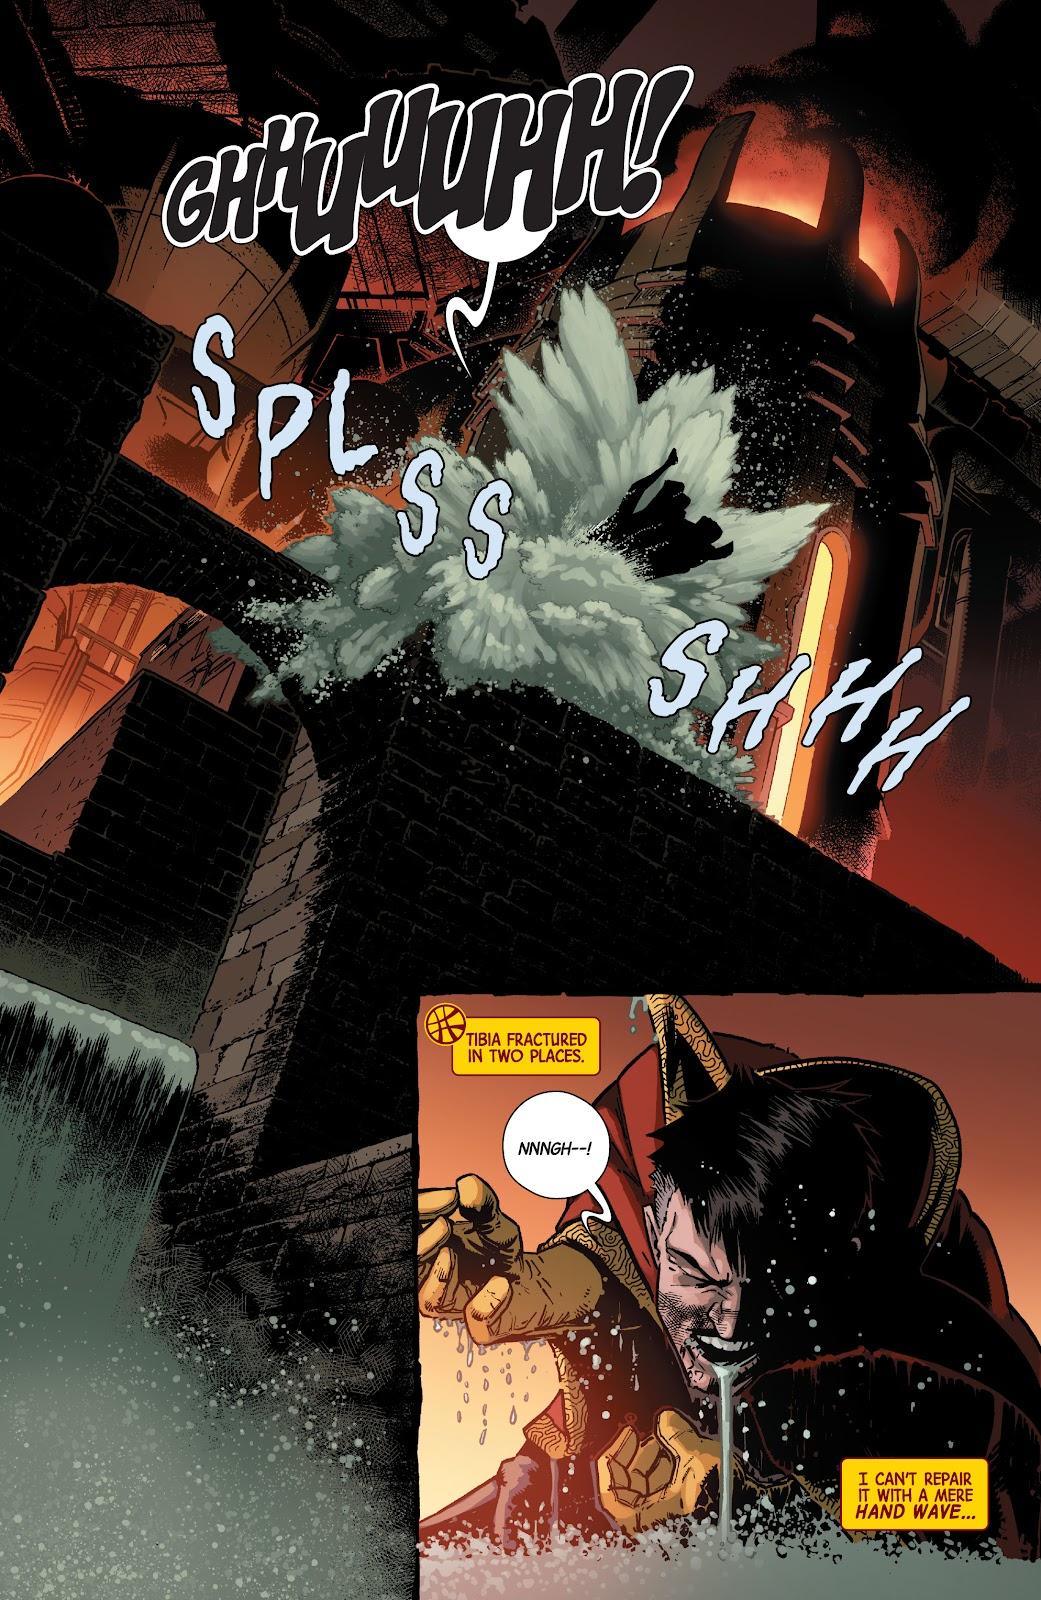 Read online Dr. Strange comic -  Issue #2 - 4